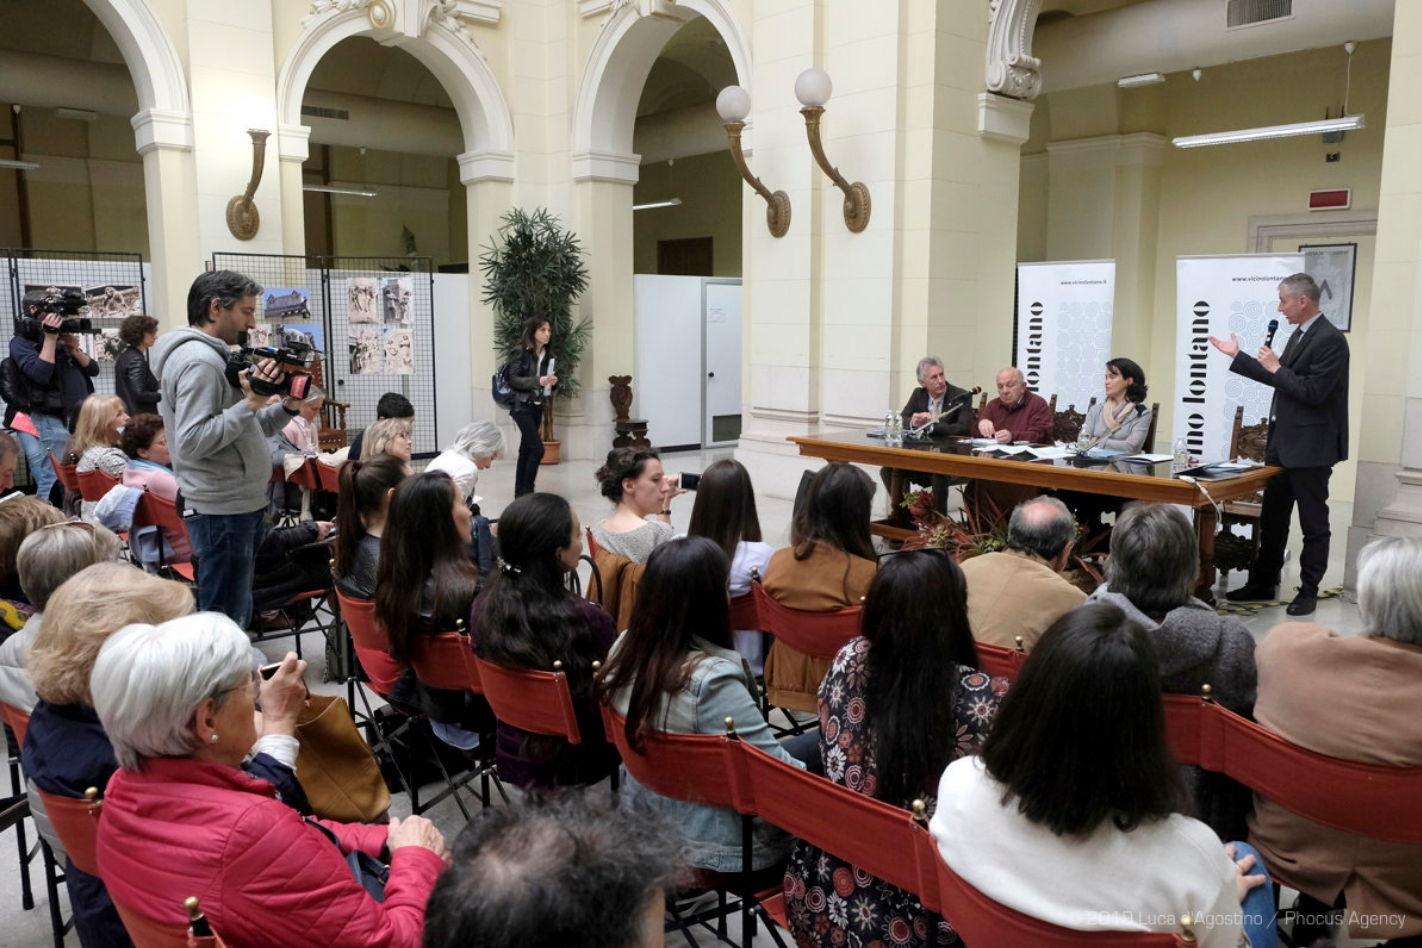 conferenza-stampa-vl-2019